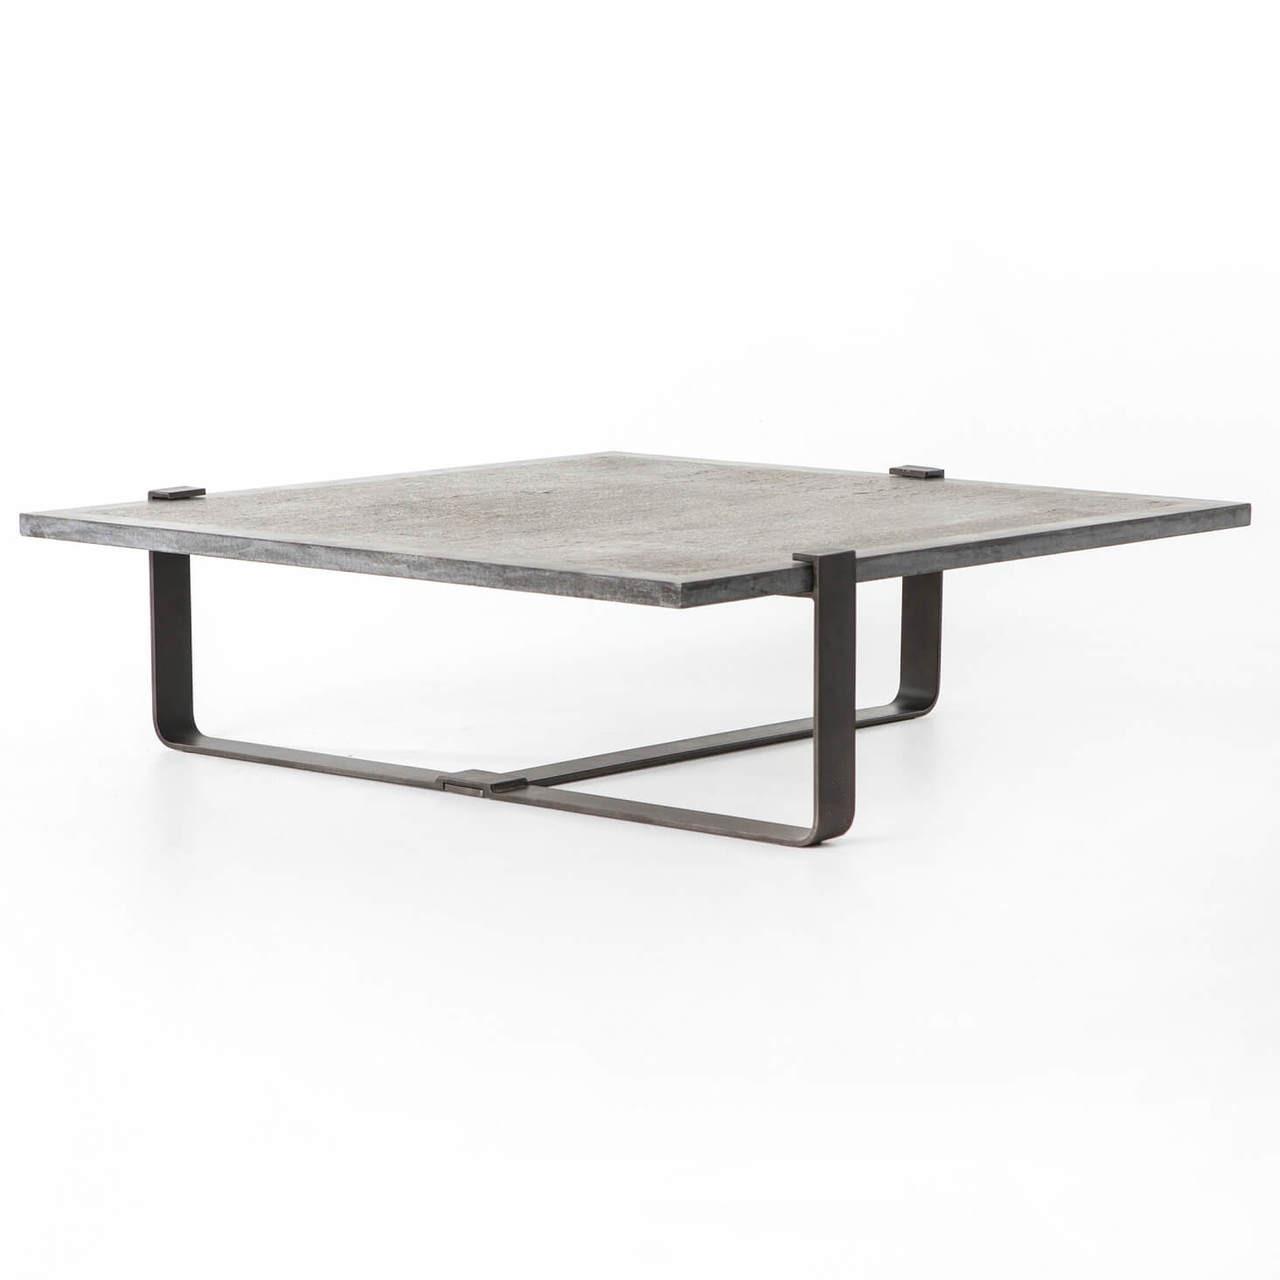 Delicieux Carino Industrial Iron Bluestone Square Coffee Table